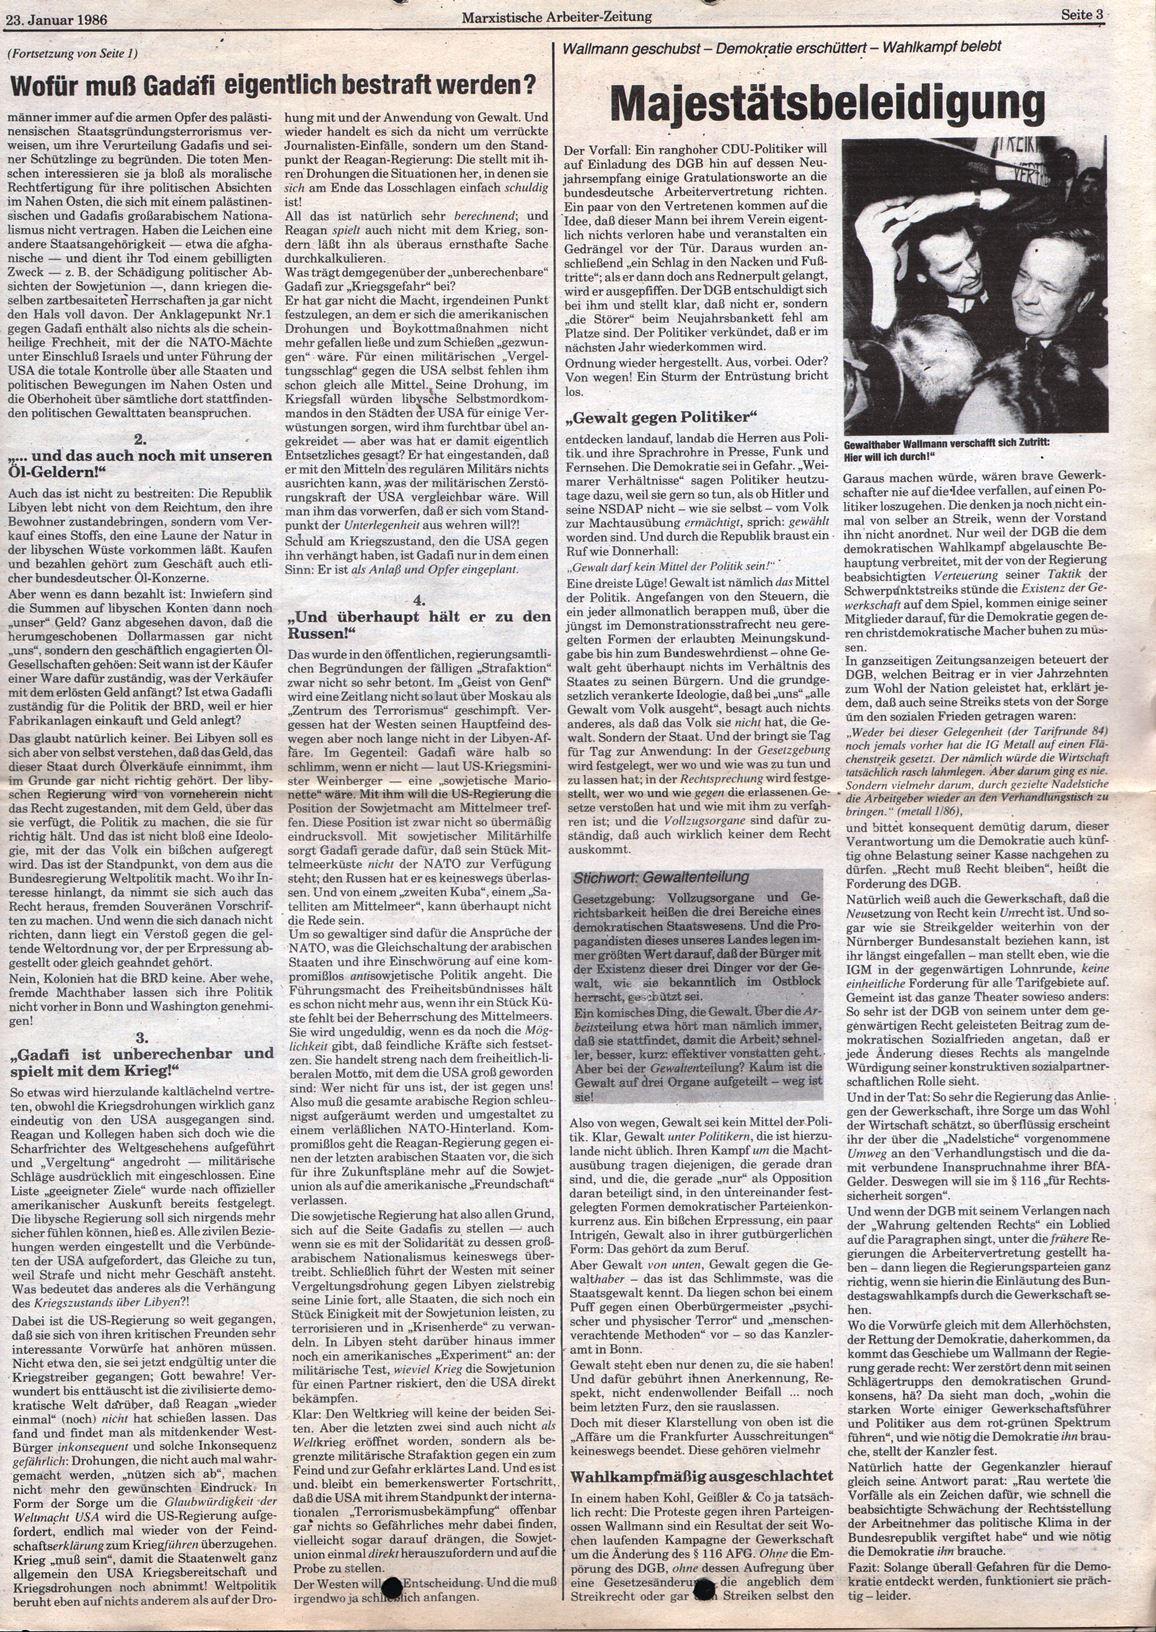 Muenchen_MG_MAZ_19860123_03